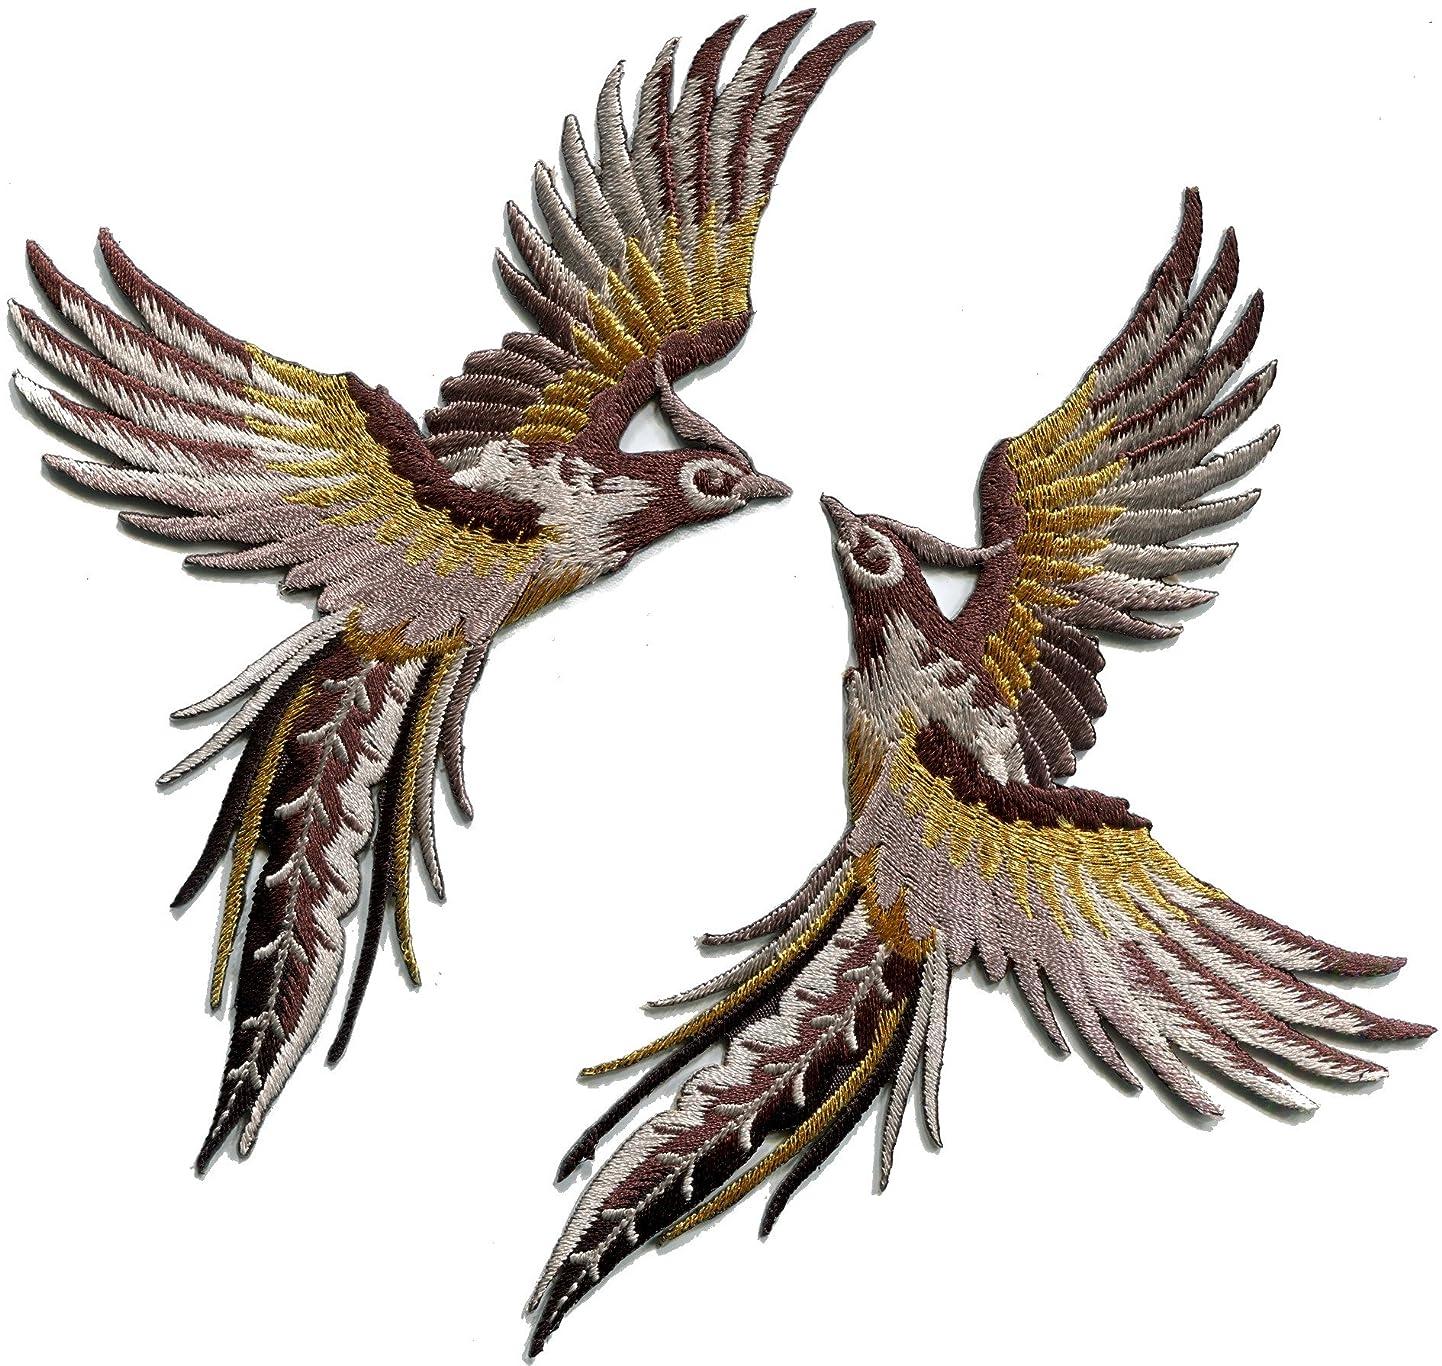 Phoenix phenix birds cedar brown black gold embroidered appliques iron-on patches pair S-1339 azlzbwsijdj7